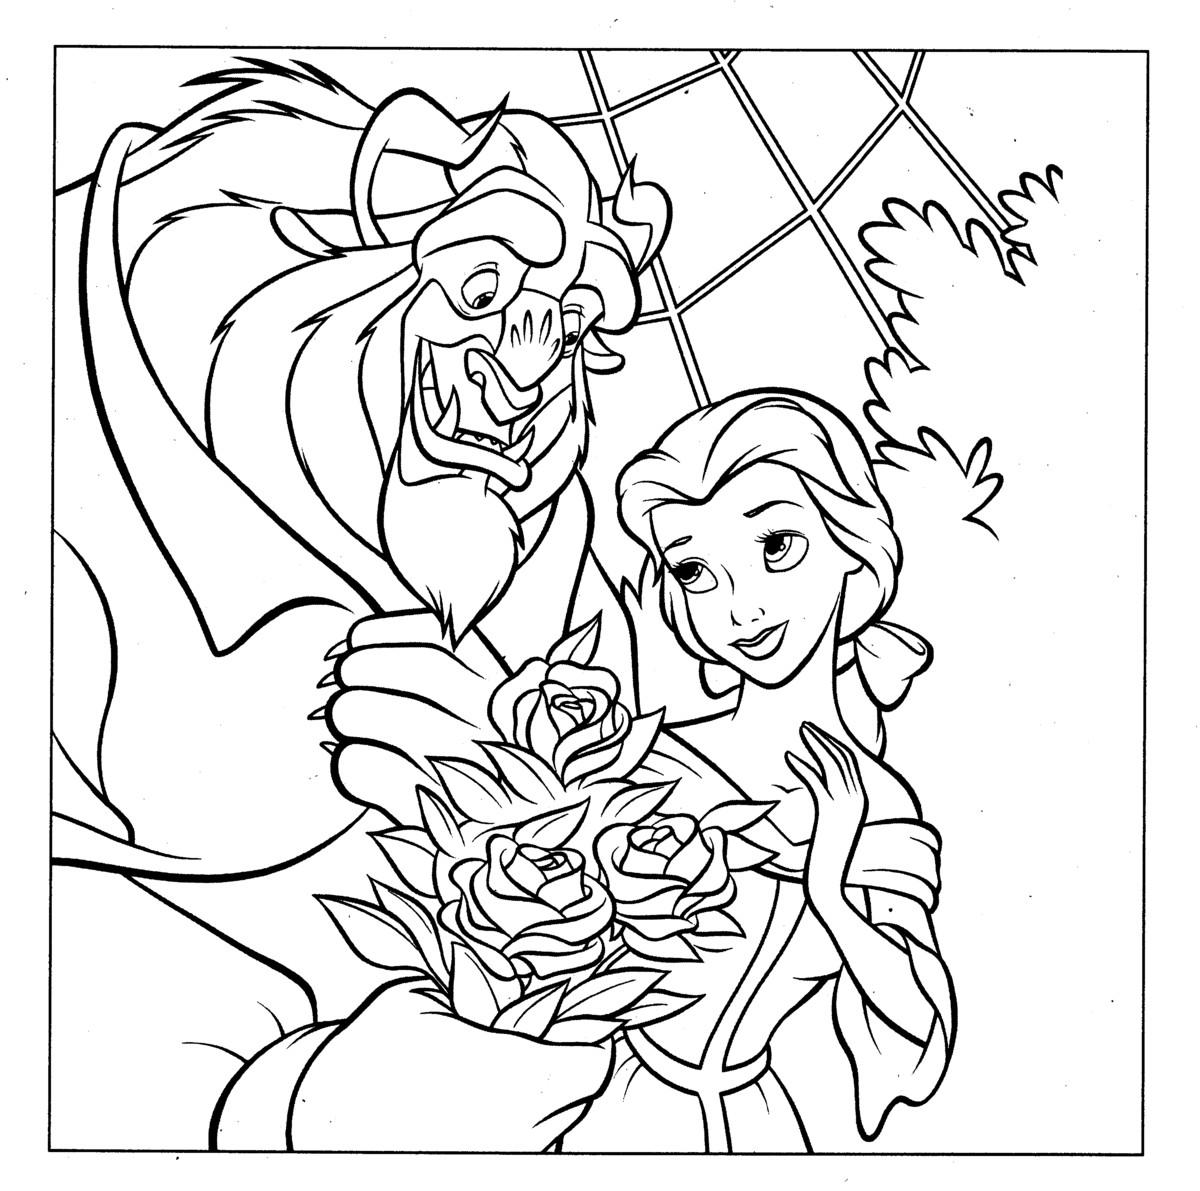 Princess Coloring Pages 25 Coloring Kids